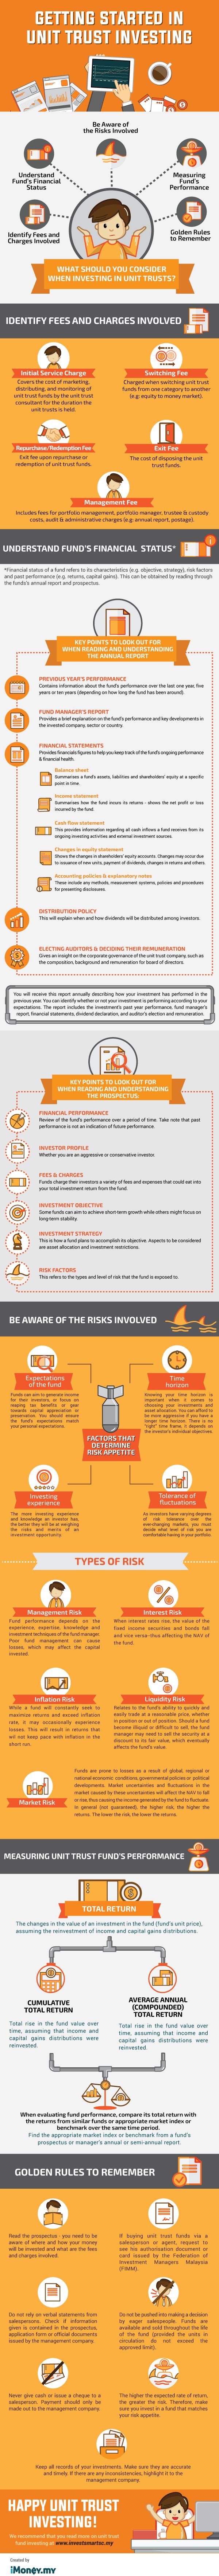 Securities-Commission-Unit-Trust-Infographic_R3